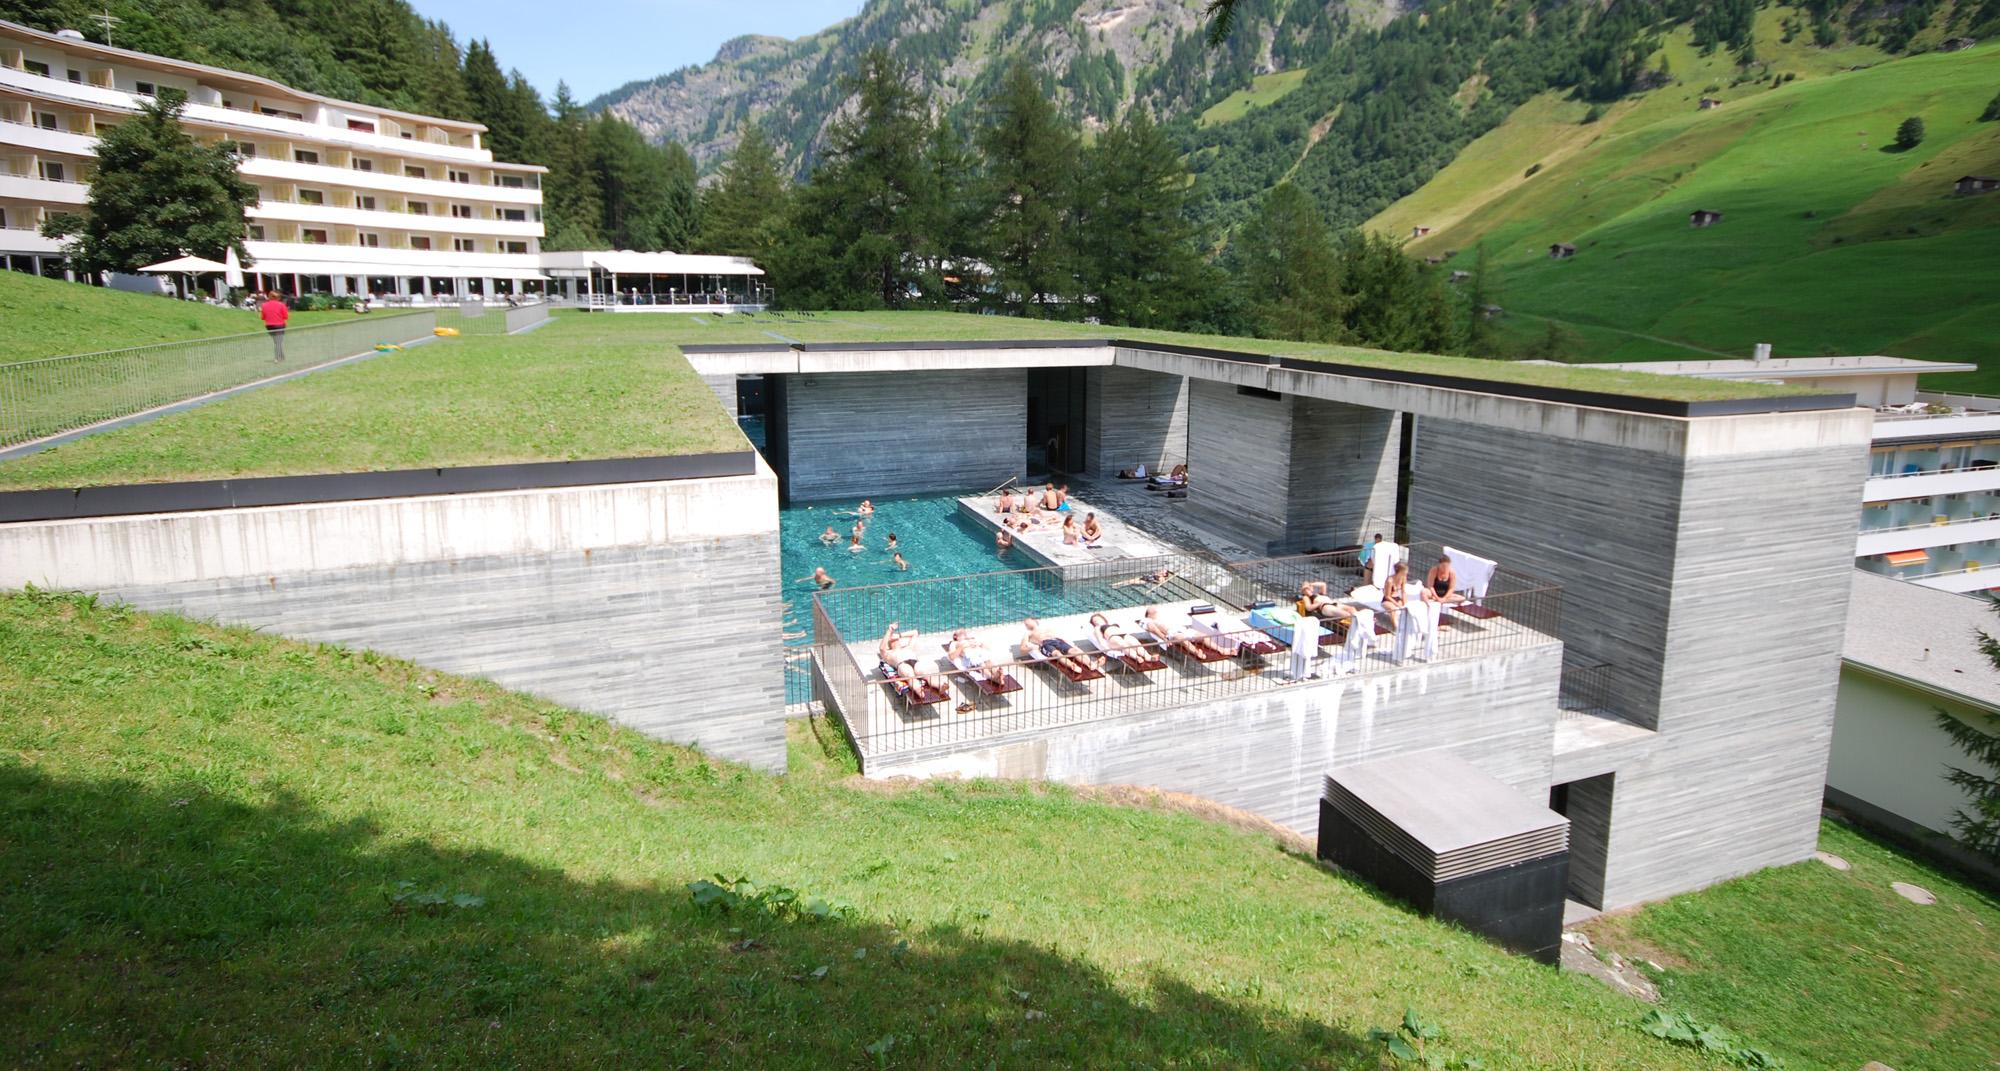 Hotel Thermal Bad Tatzmannsdorf